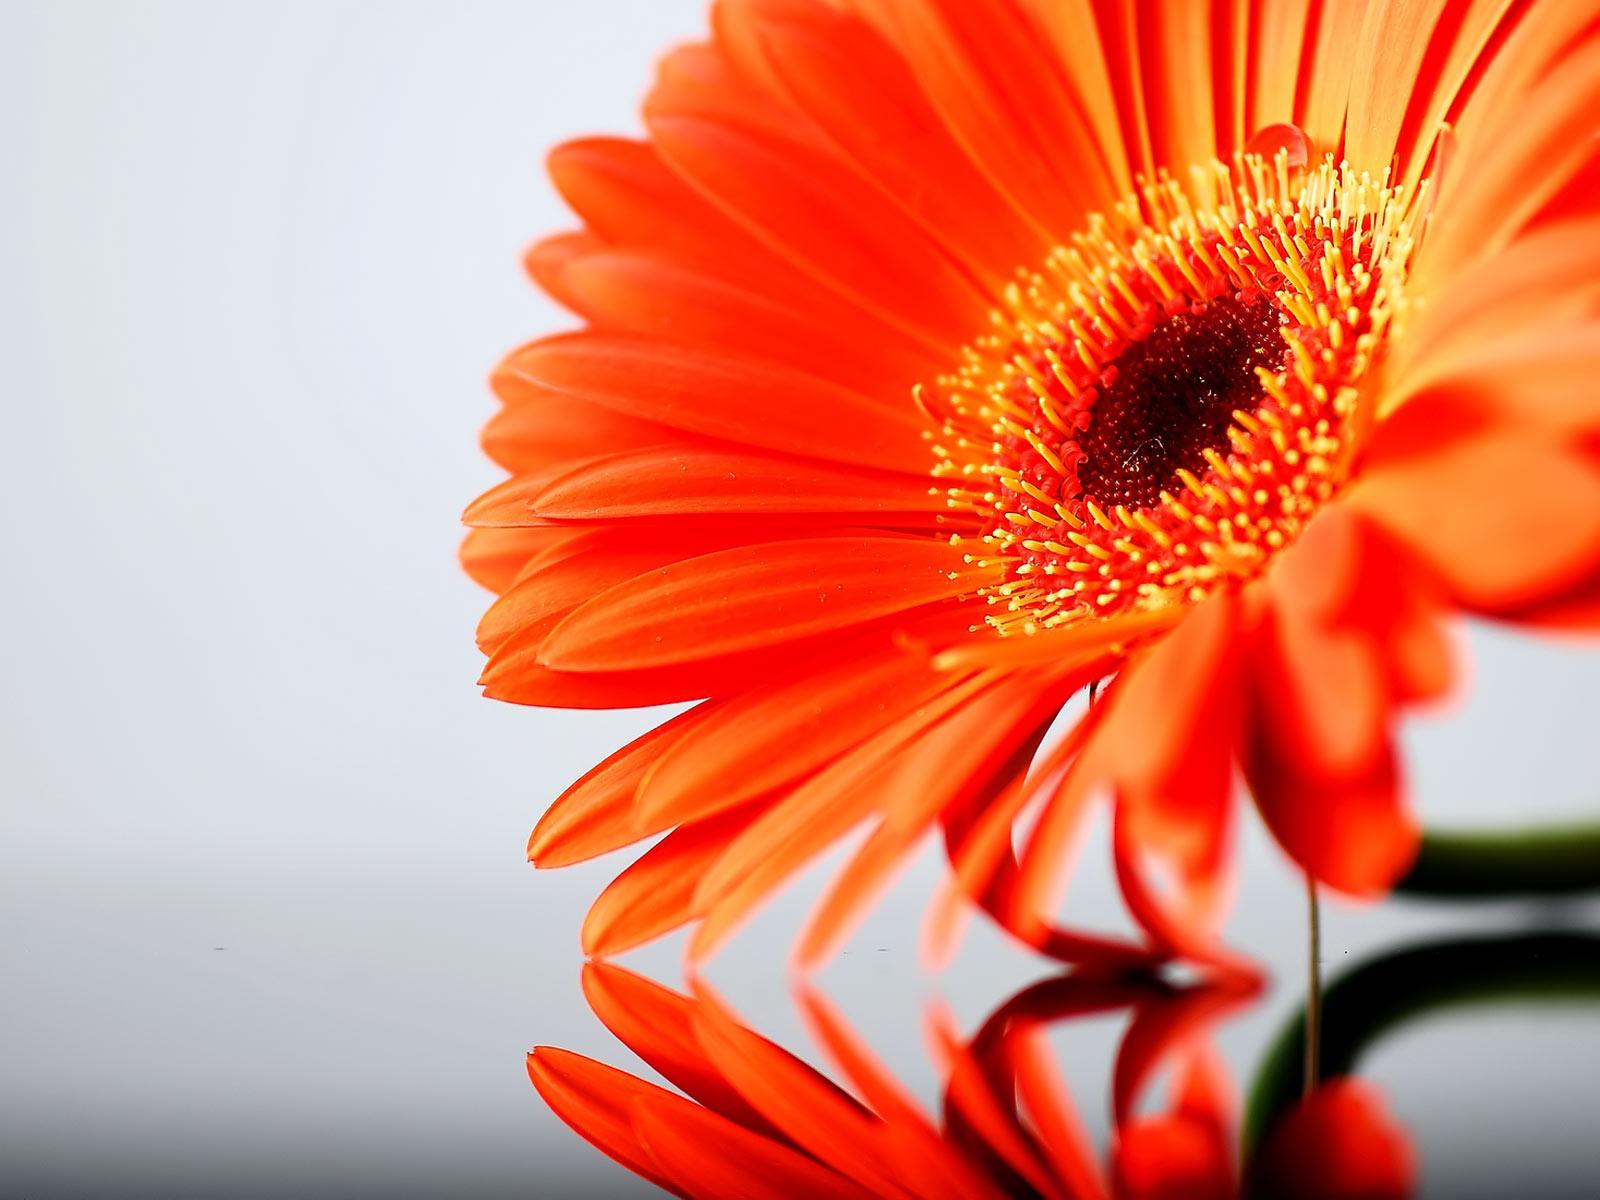 http://1.bp.blogspot.com/-J4mQEwpwrzs/T1sNk3rOT_I/AAAAAAAAPj0/JaMc8jeiCck/s1600/Orange_gerbera_daisy_Flower-wallpaper.jpg